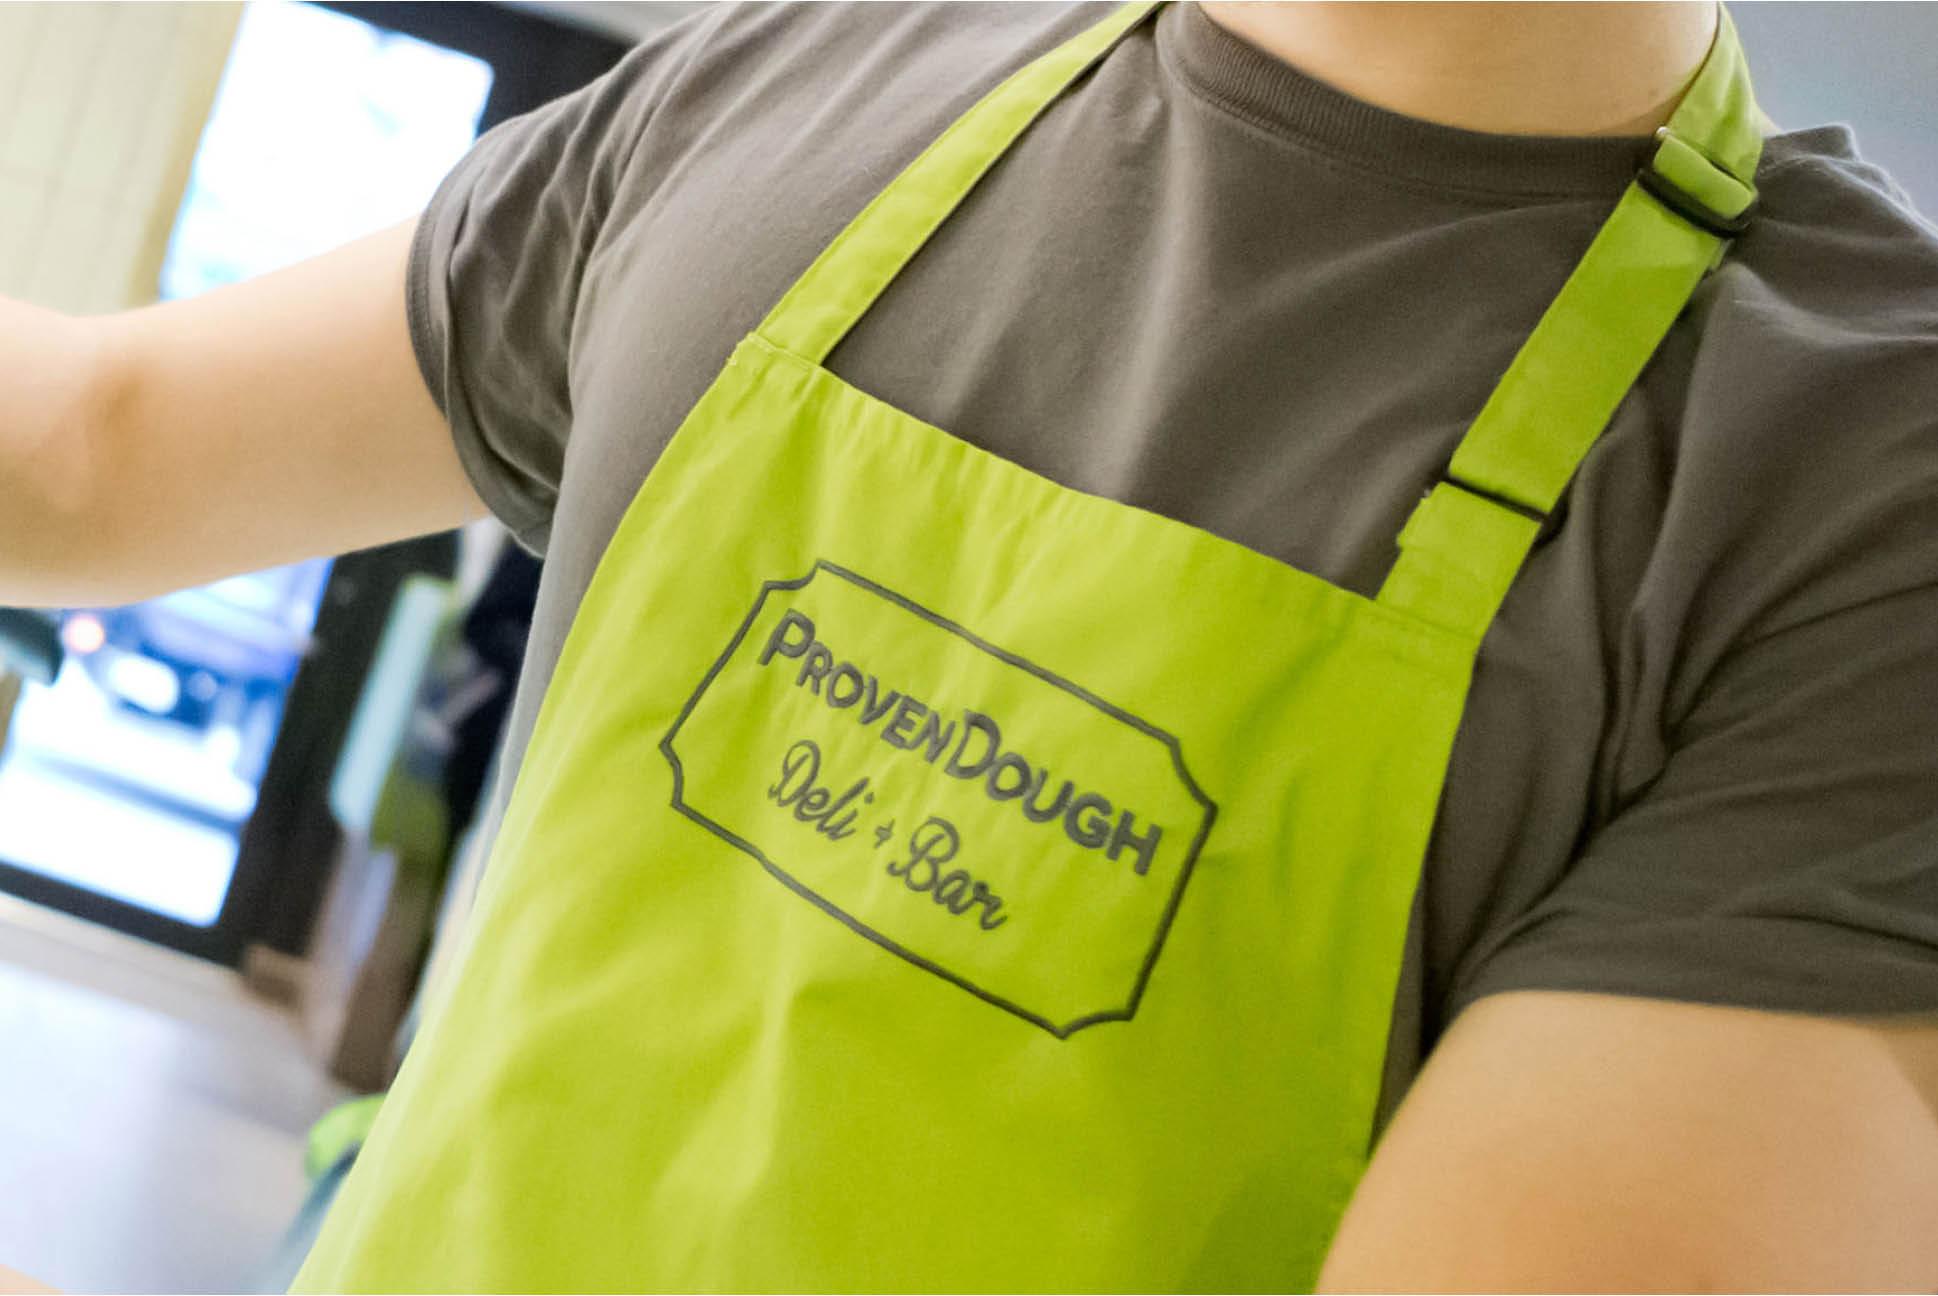 ProvenDough Uniform | Branding and Identity Design - Independent Marketing | IM London